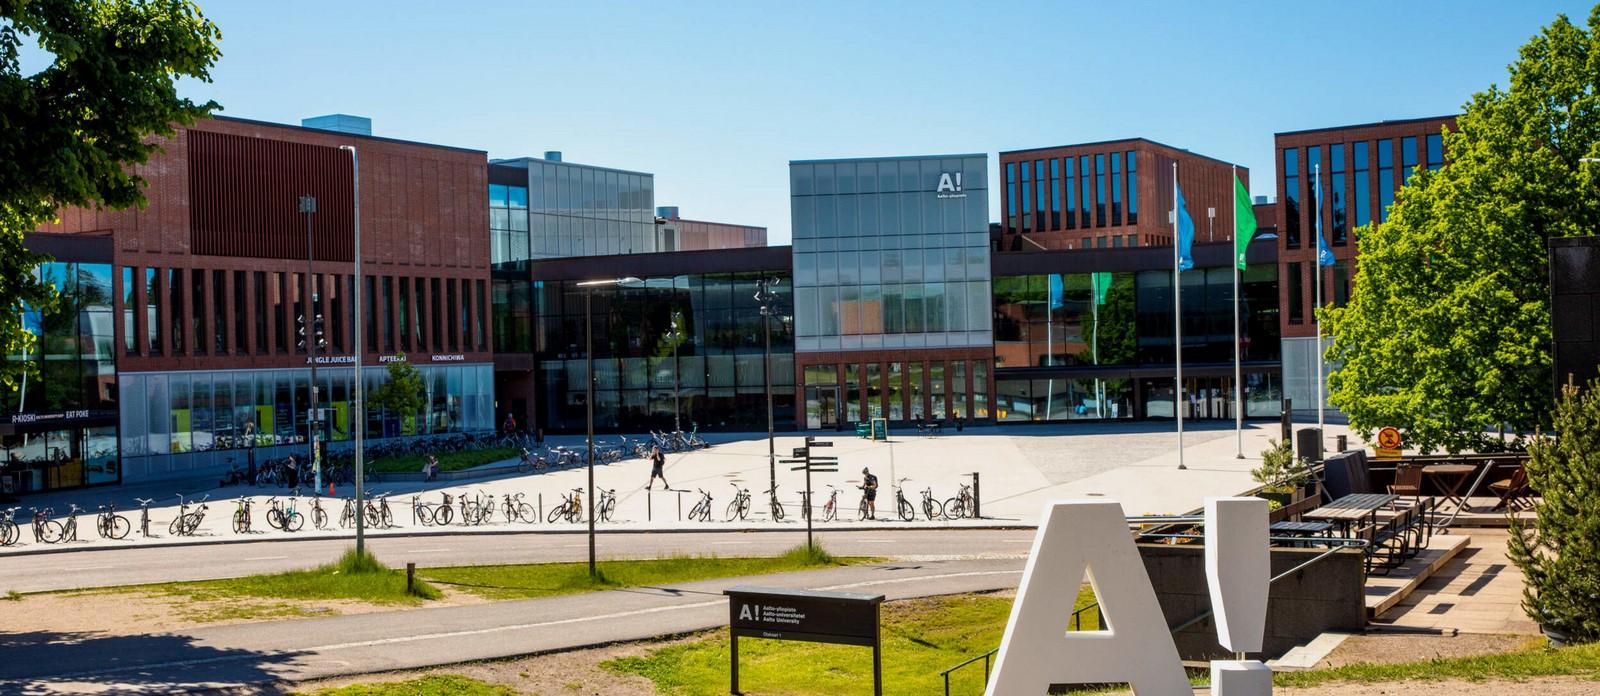 15 Top universities in Europe for Masters in Design - Sheet4